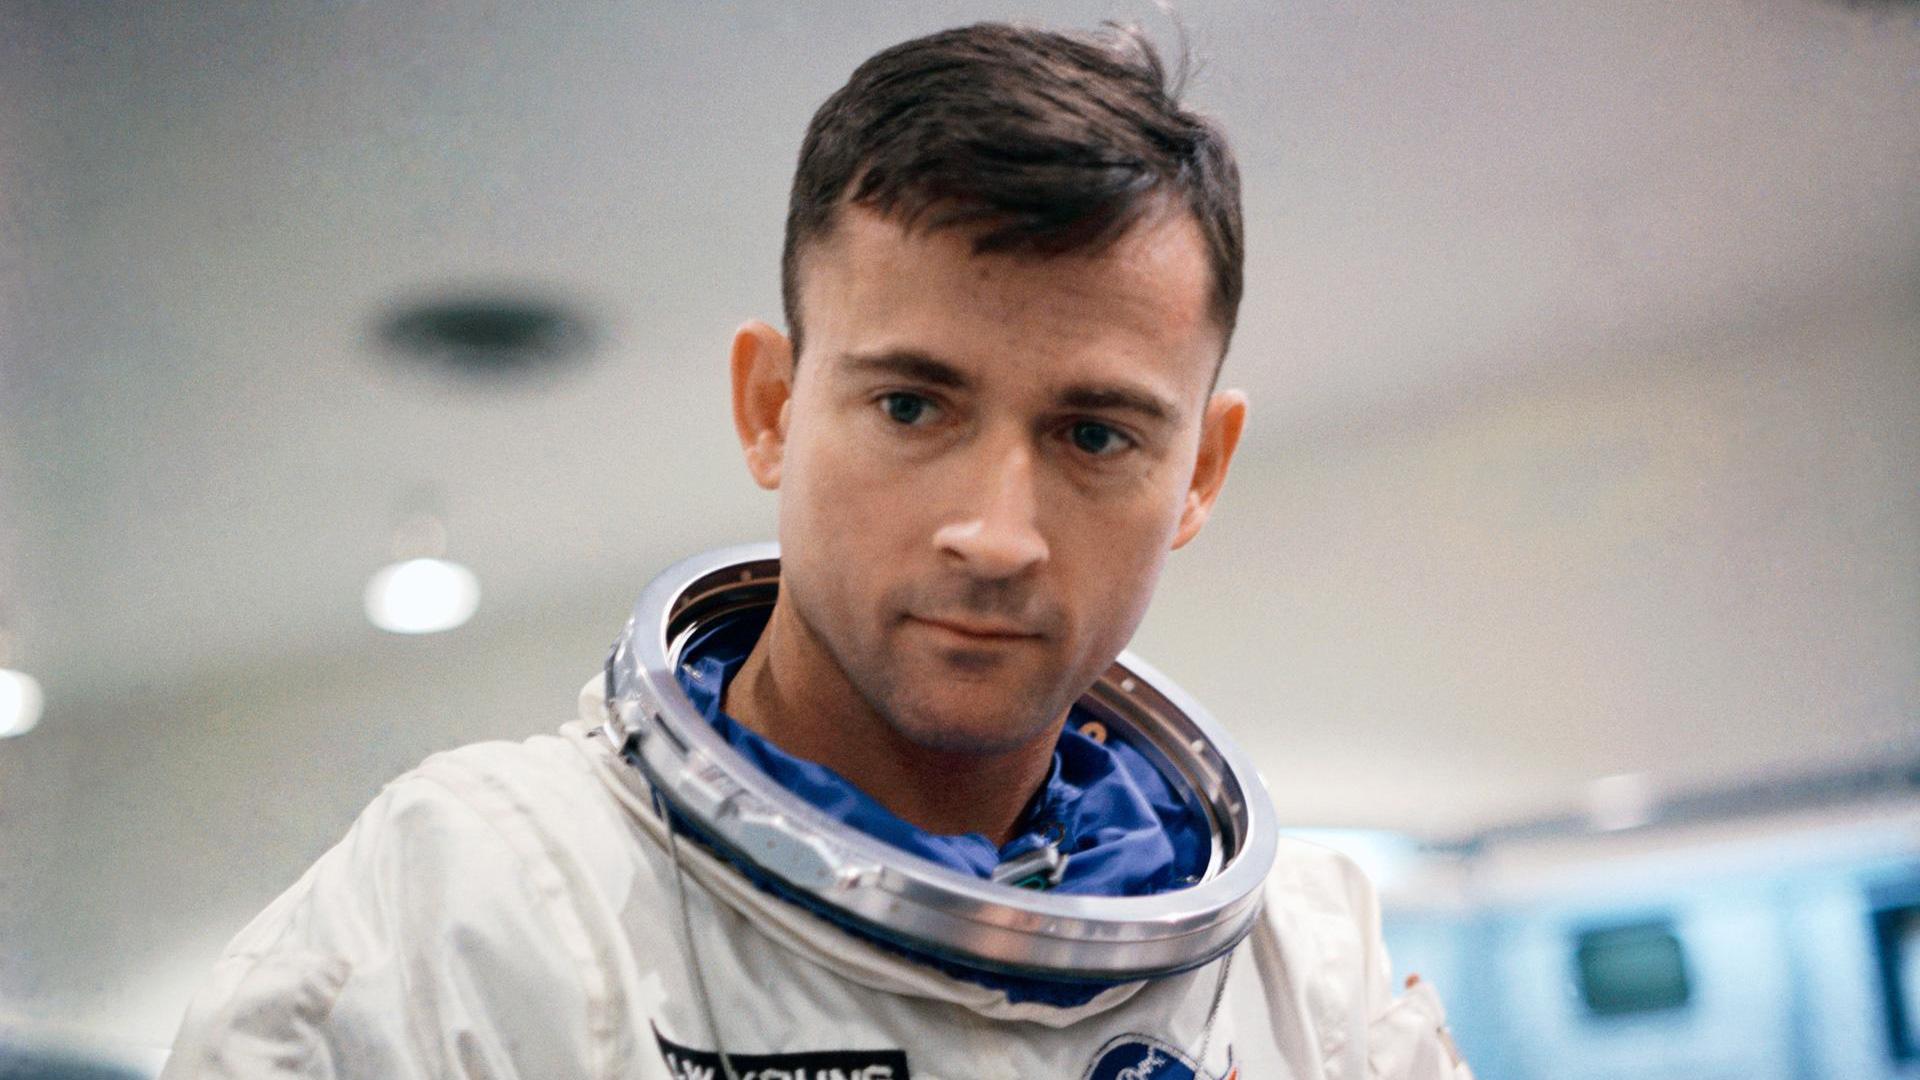 American Hero Astronaut John Young Passes Away